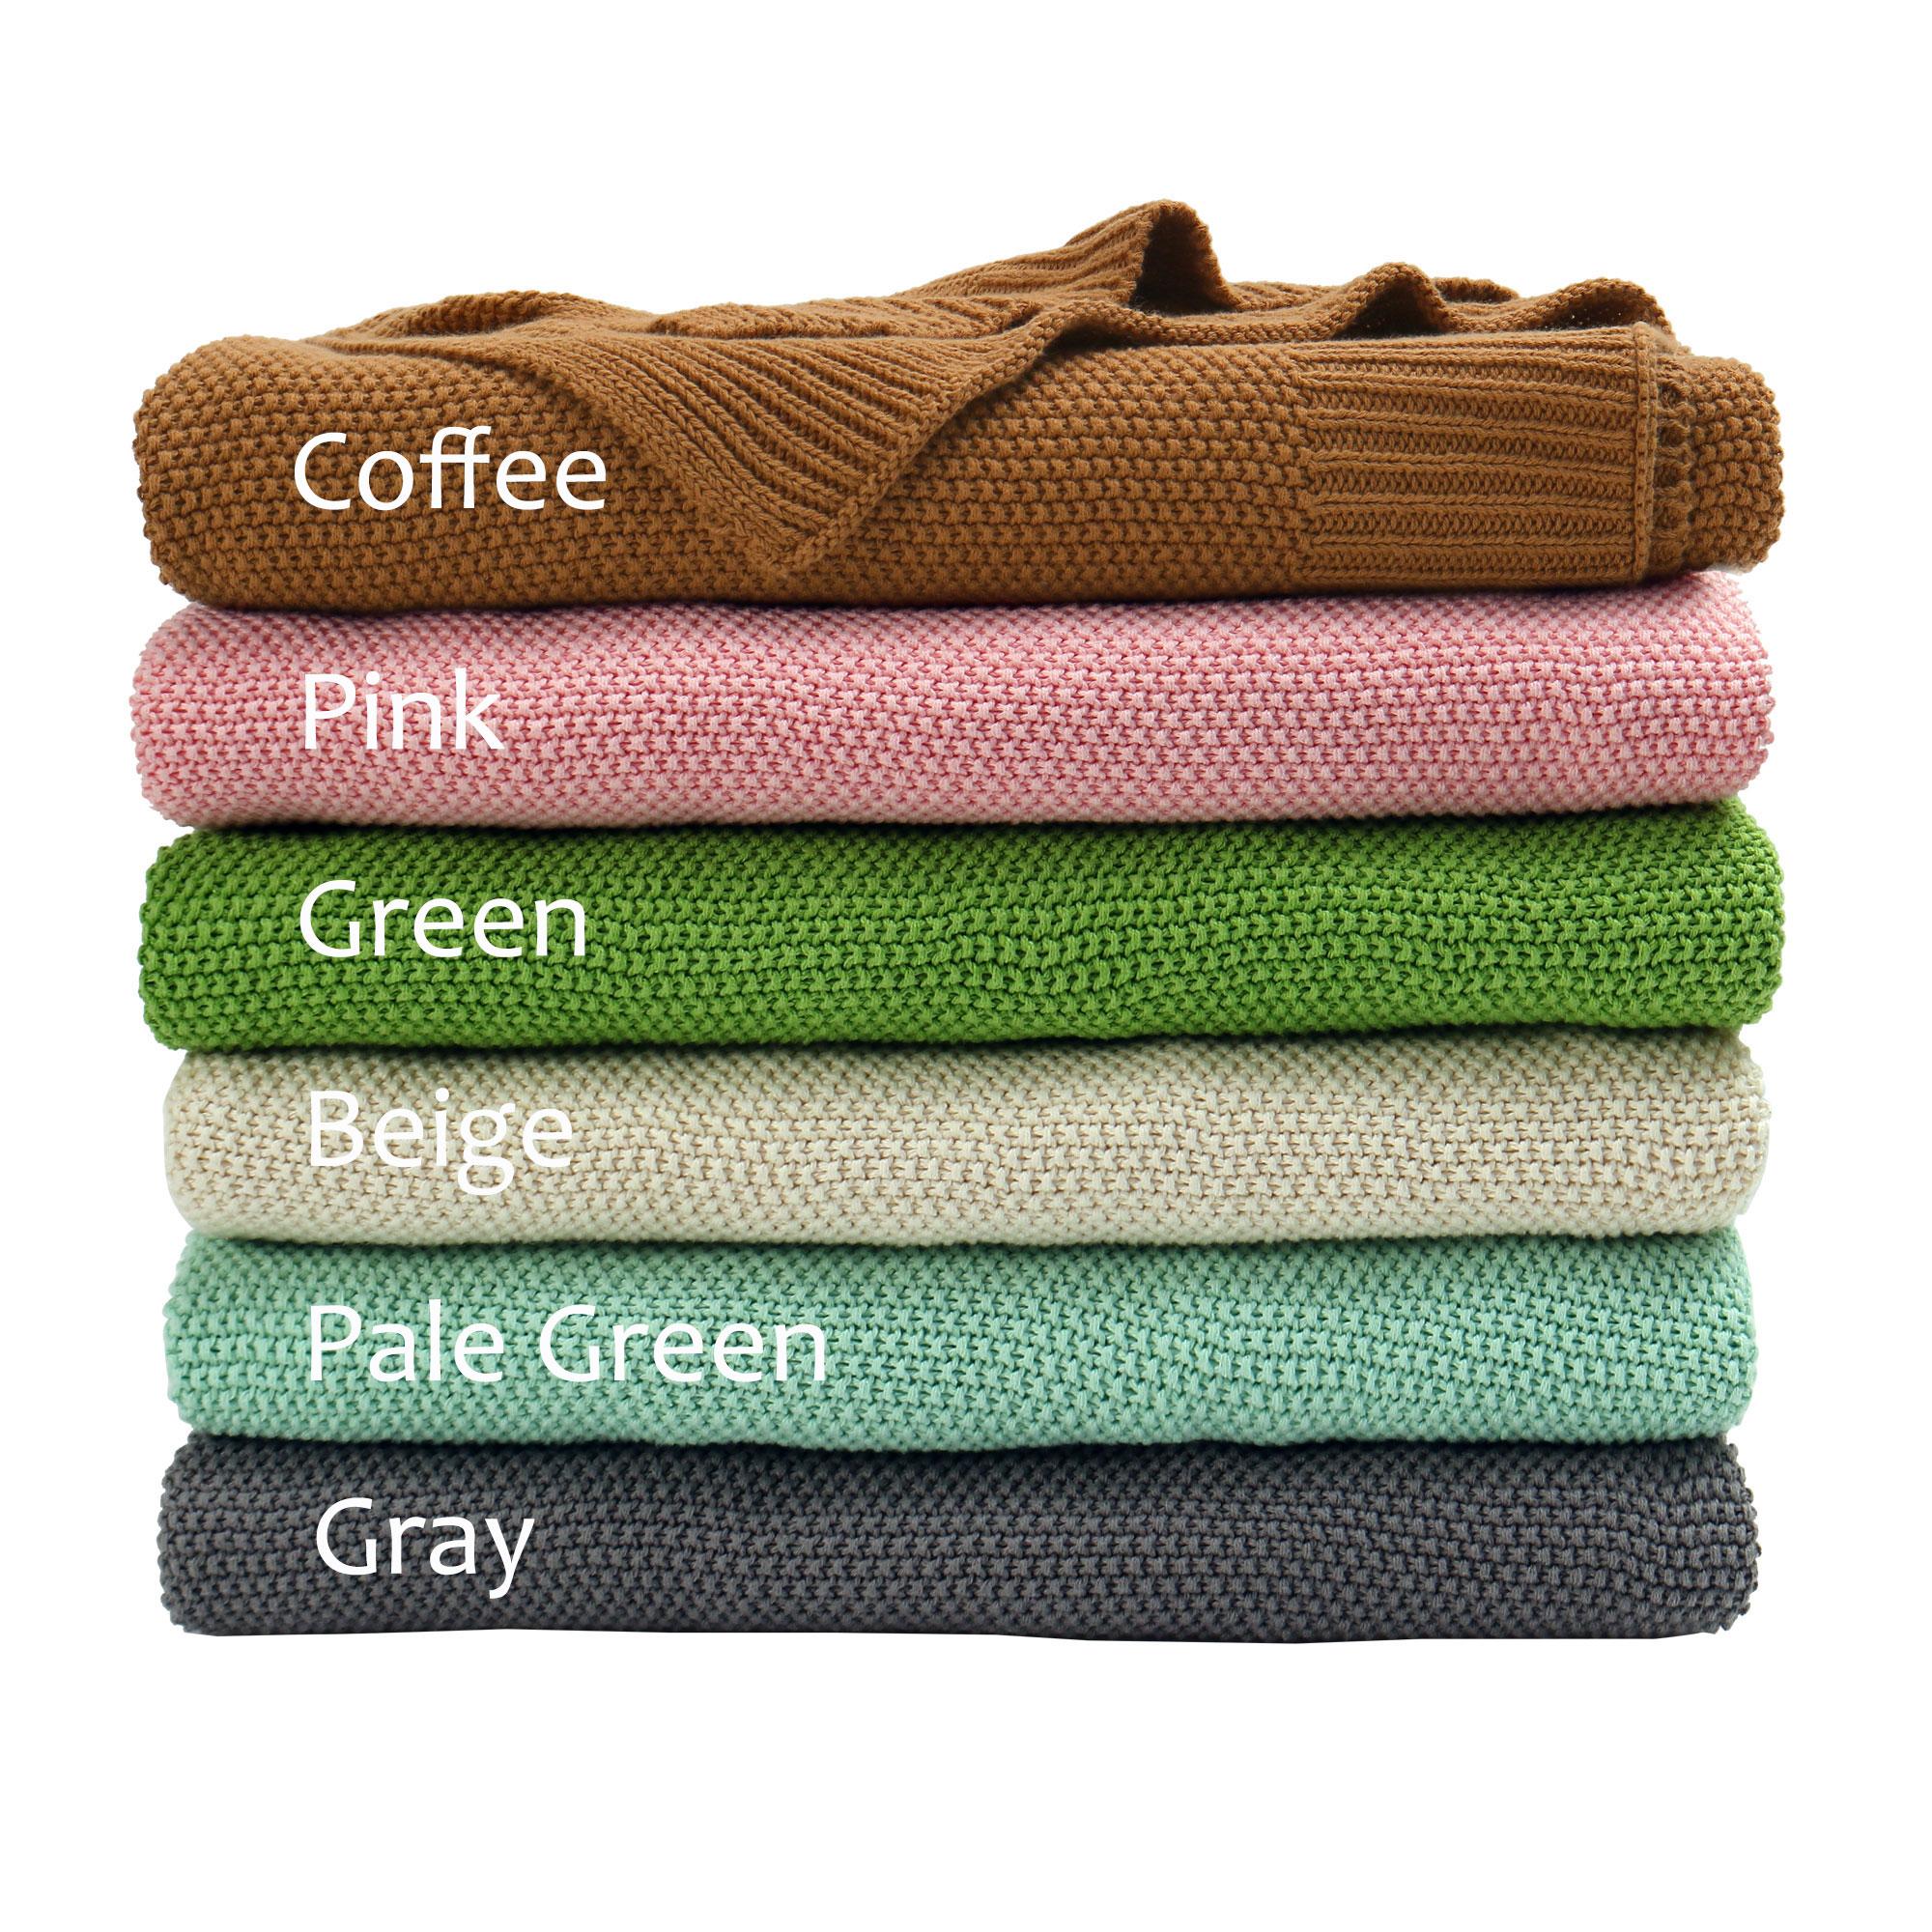 "100% Cotton Soft Warm Knit Throw Blanket Bed Sofa Home Decor 50"" x 60"" Gray"